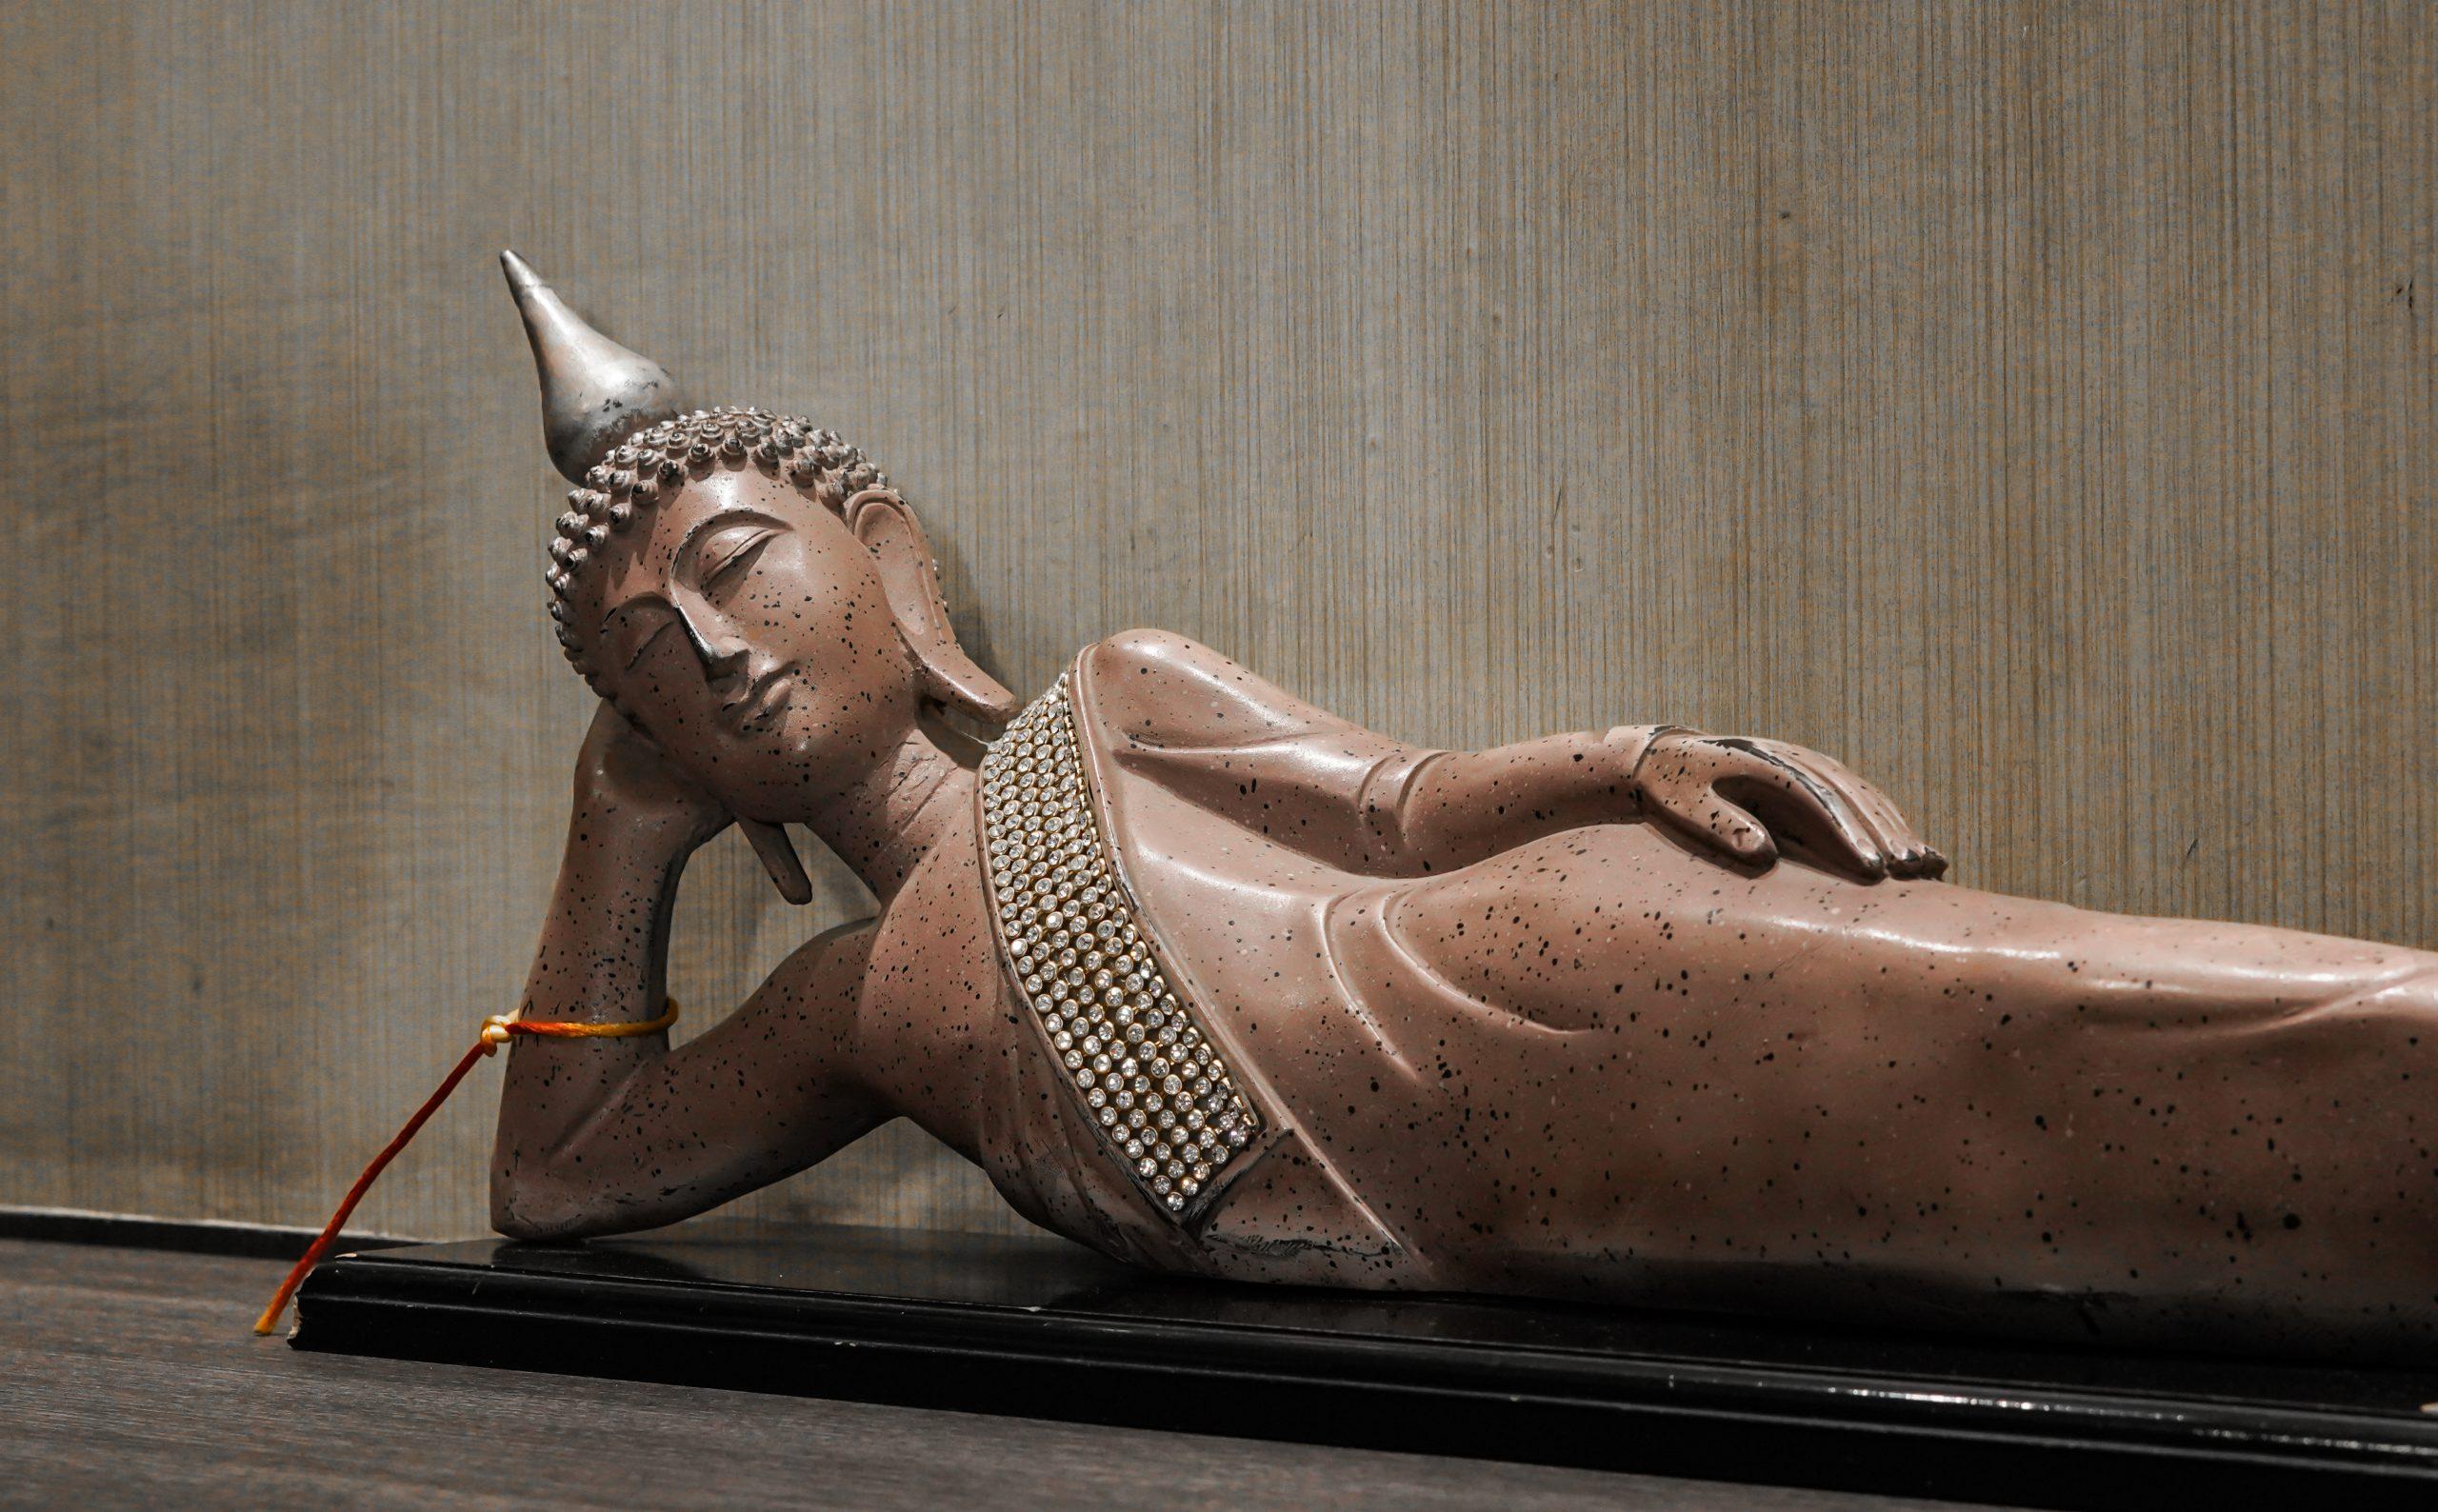 A statue of Lord Buddha